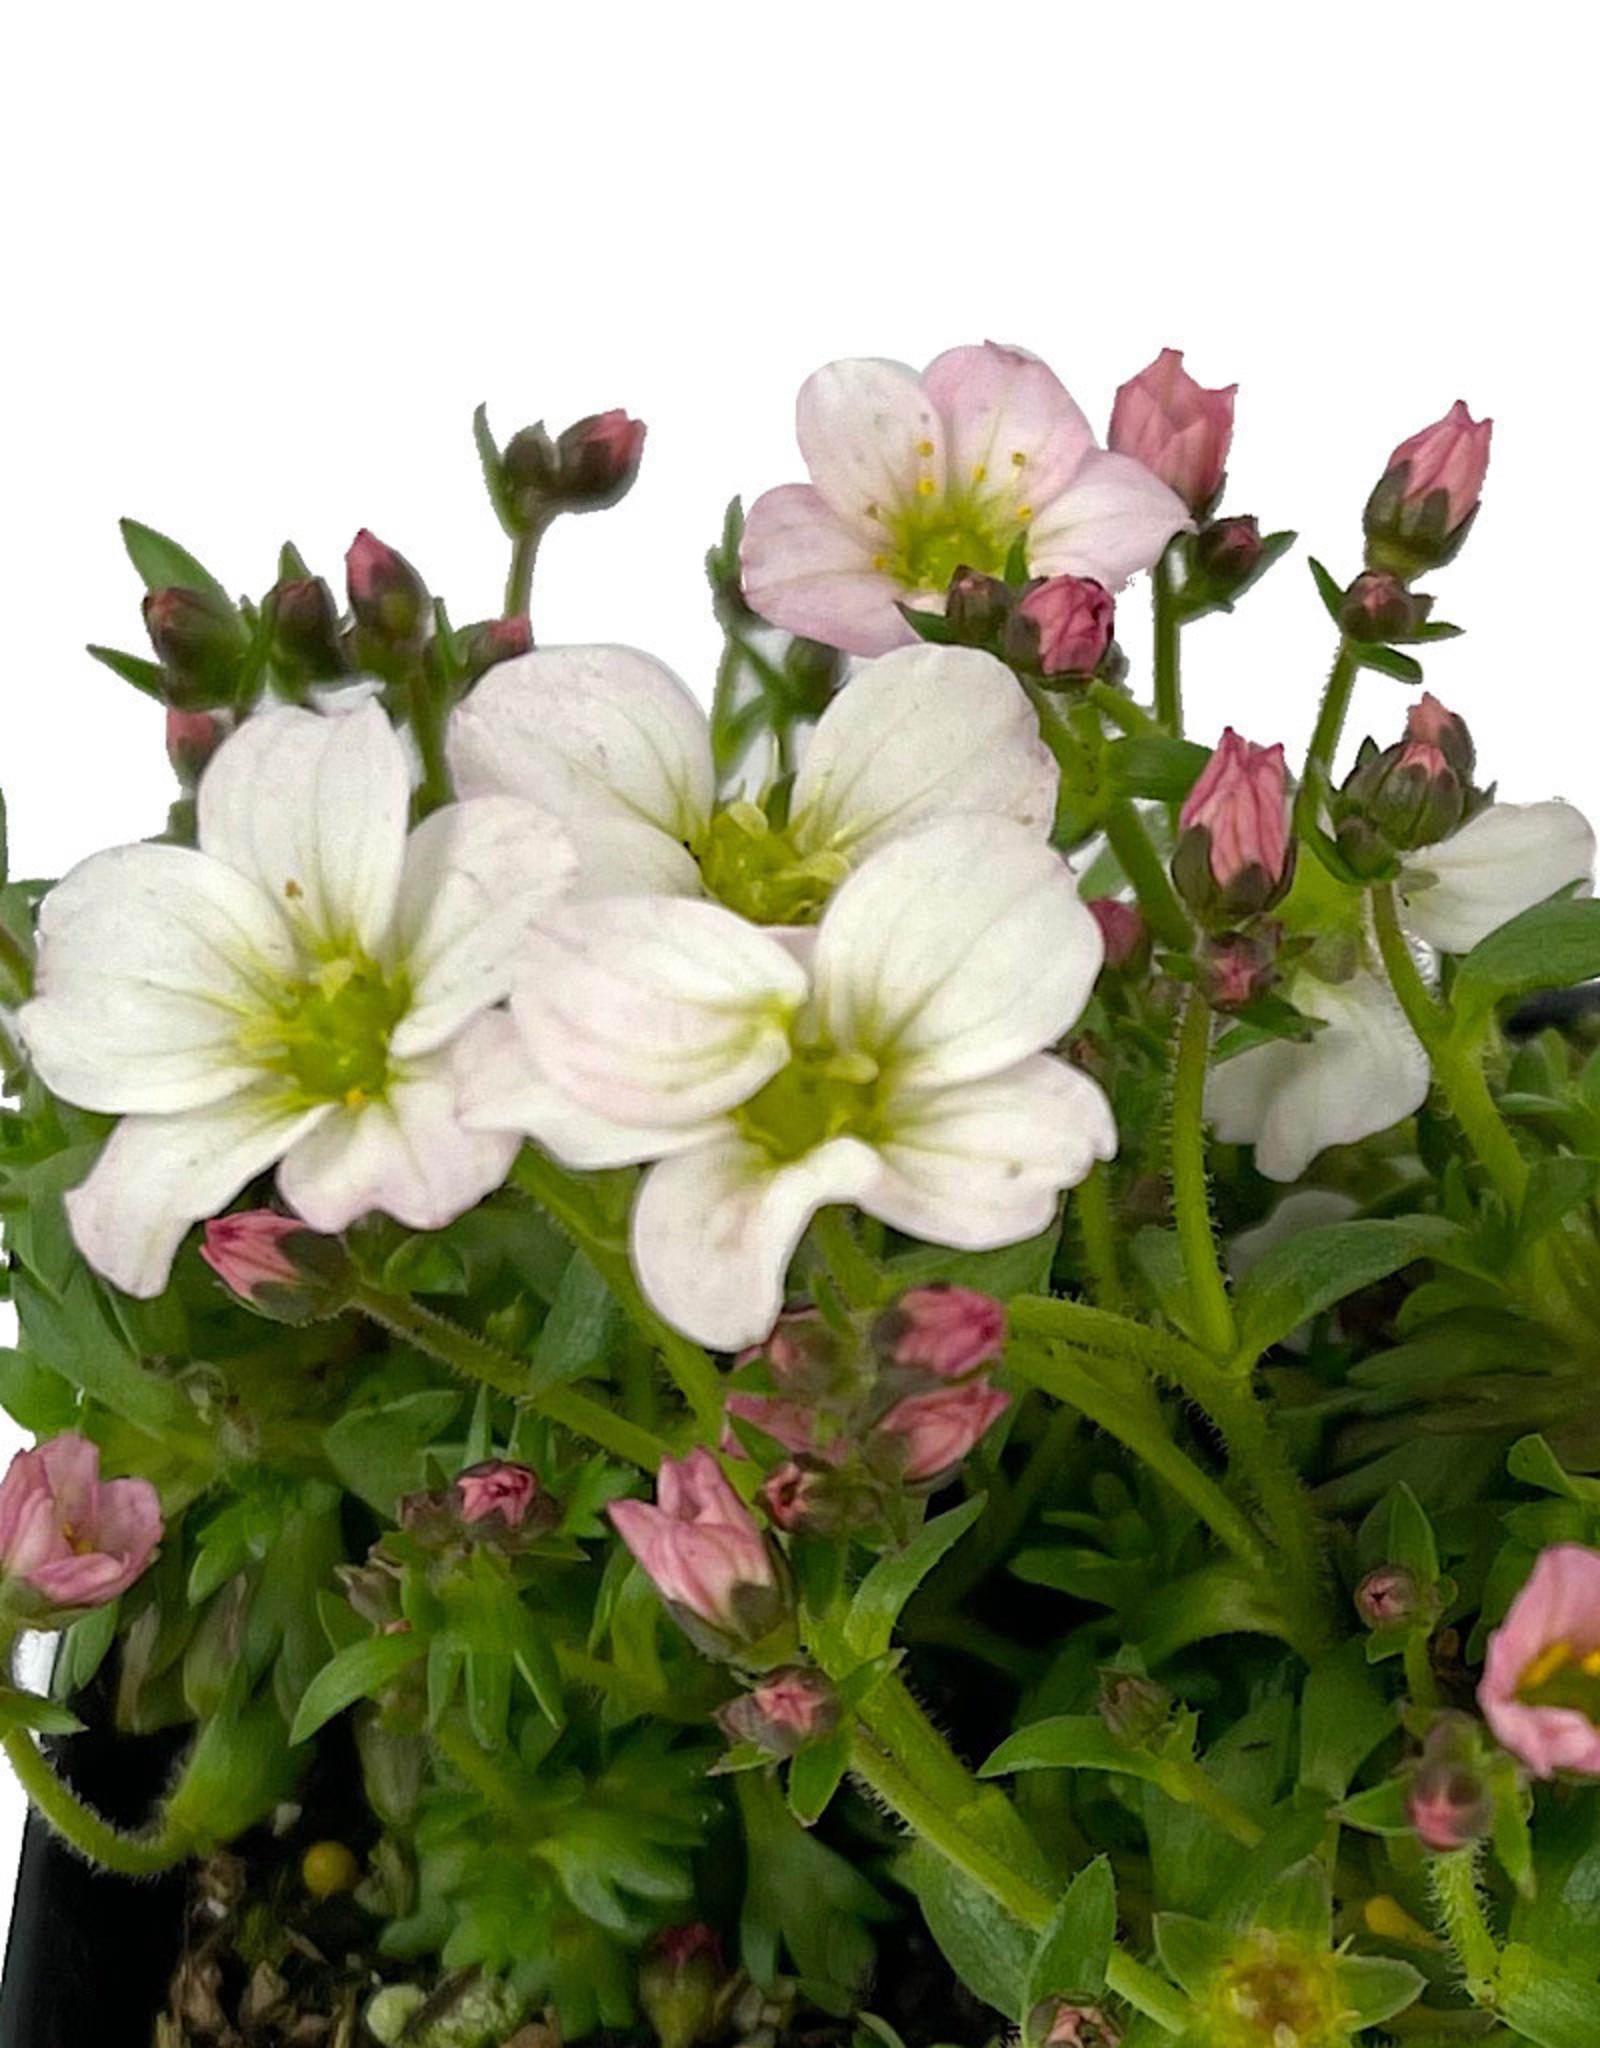 Saxifraga 'Alpino White' 4 inch